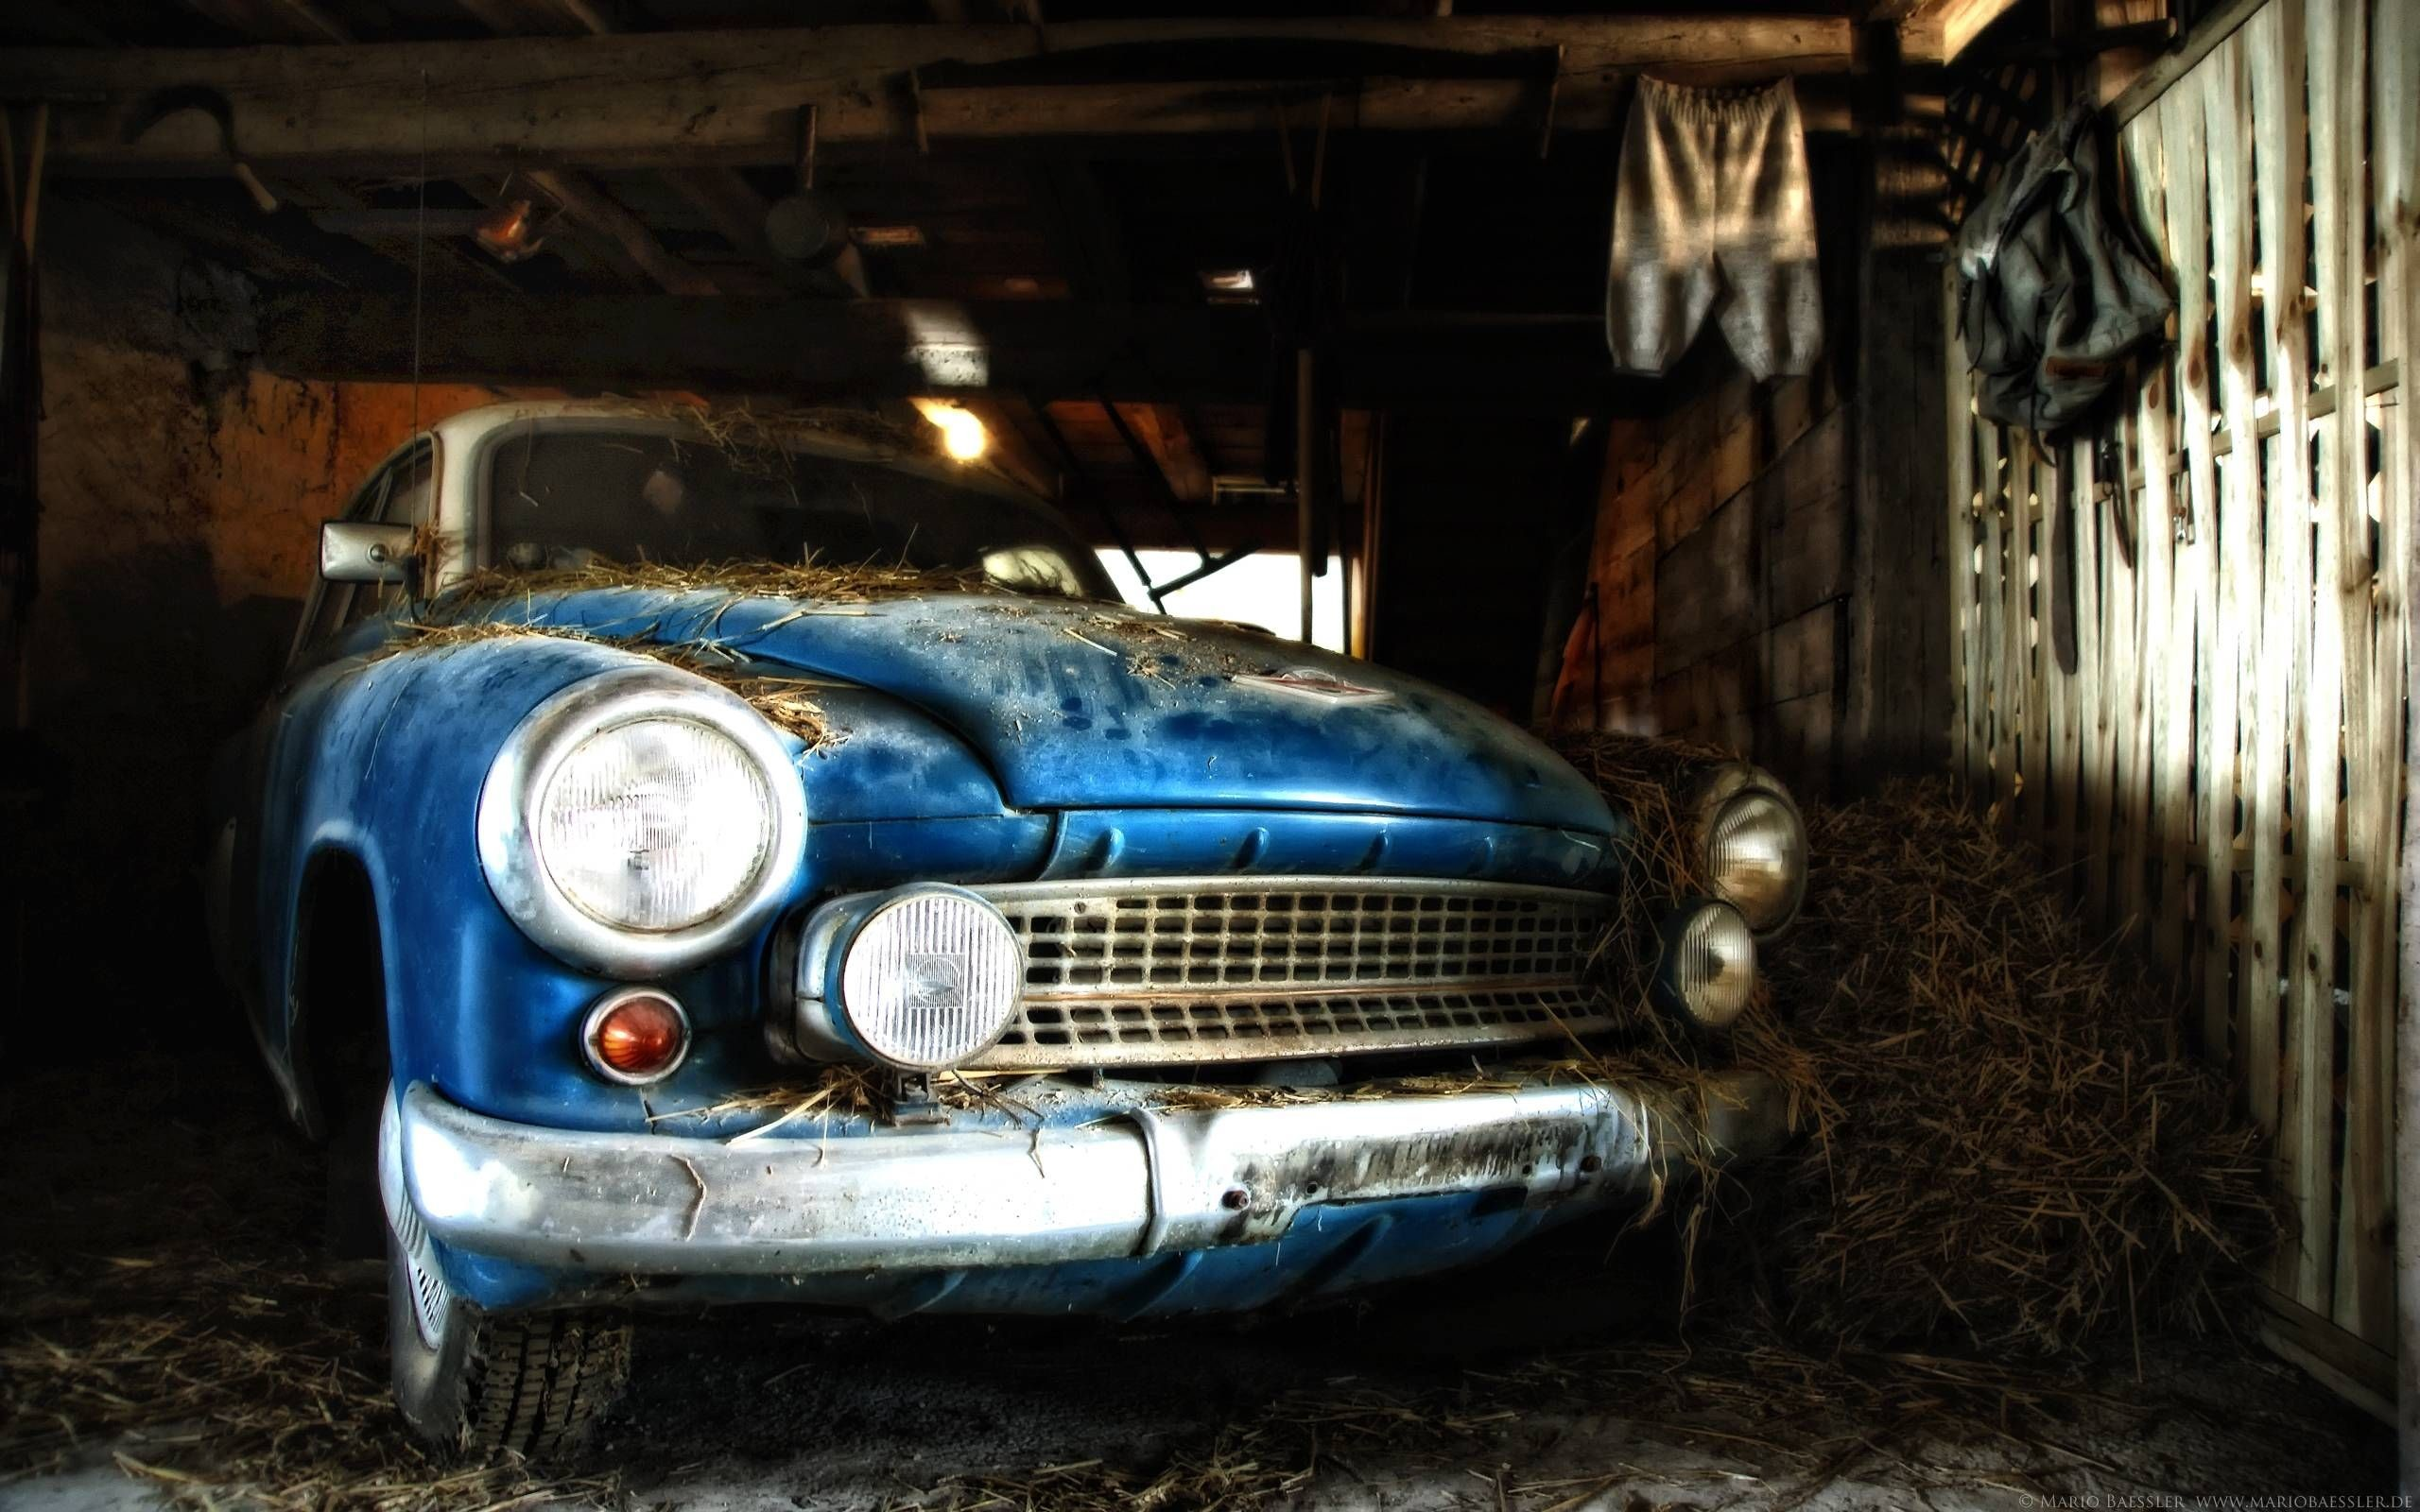 Res: 2560x1600, Old Car And Shack Wallpaper | Artworks Jongens | Pinterest | Cars